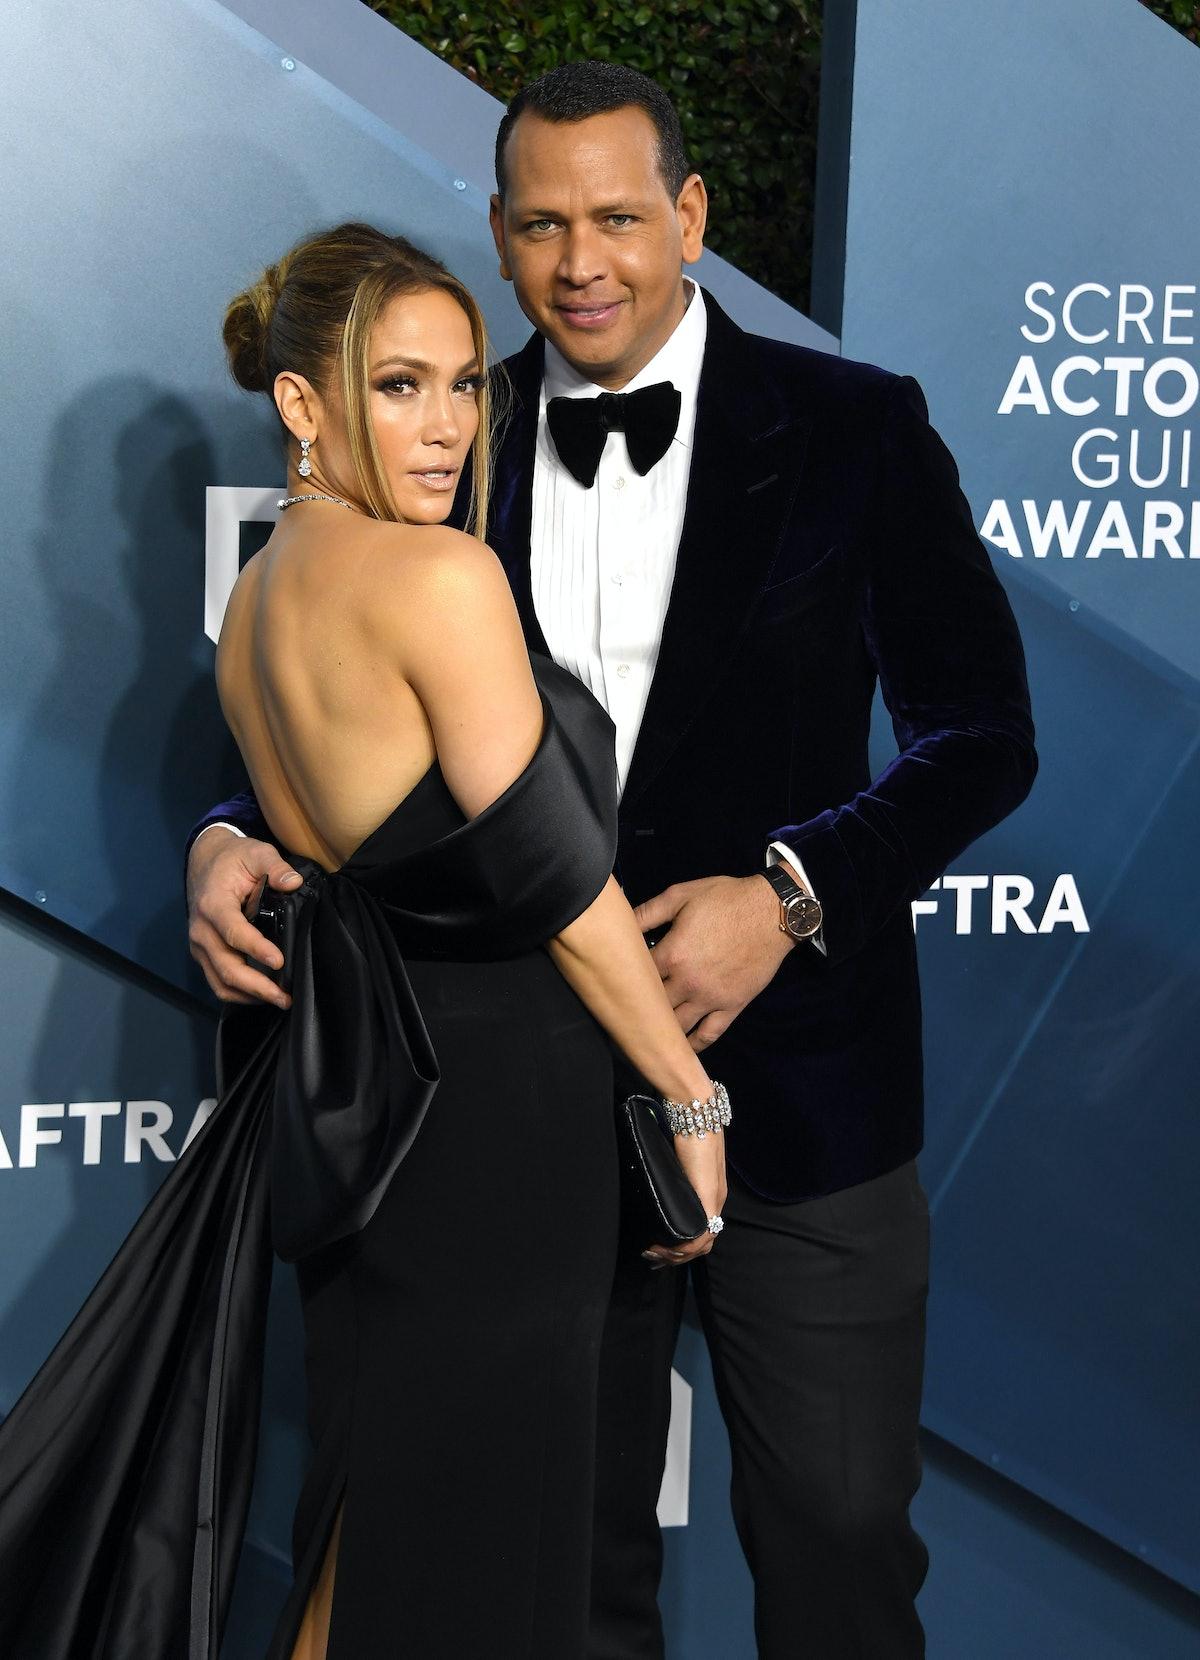 Alex Rodriguez wished Jennifer Lopez well in a post-breakup interview.